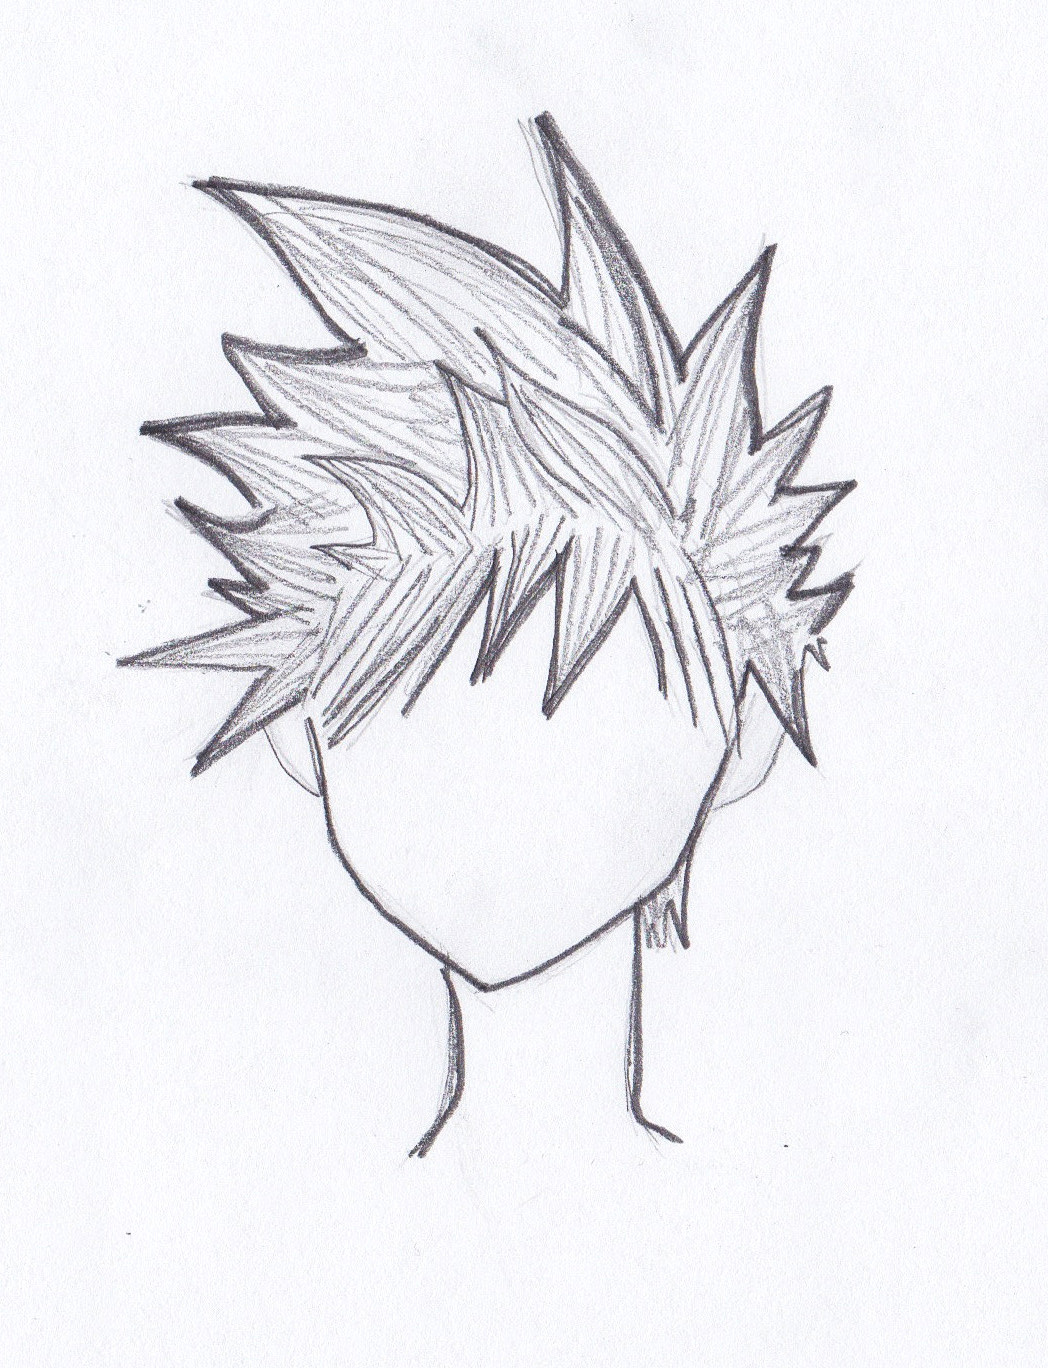 1048x1368 Definitive Guide To Drawing Manga Hair